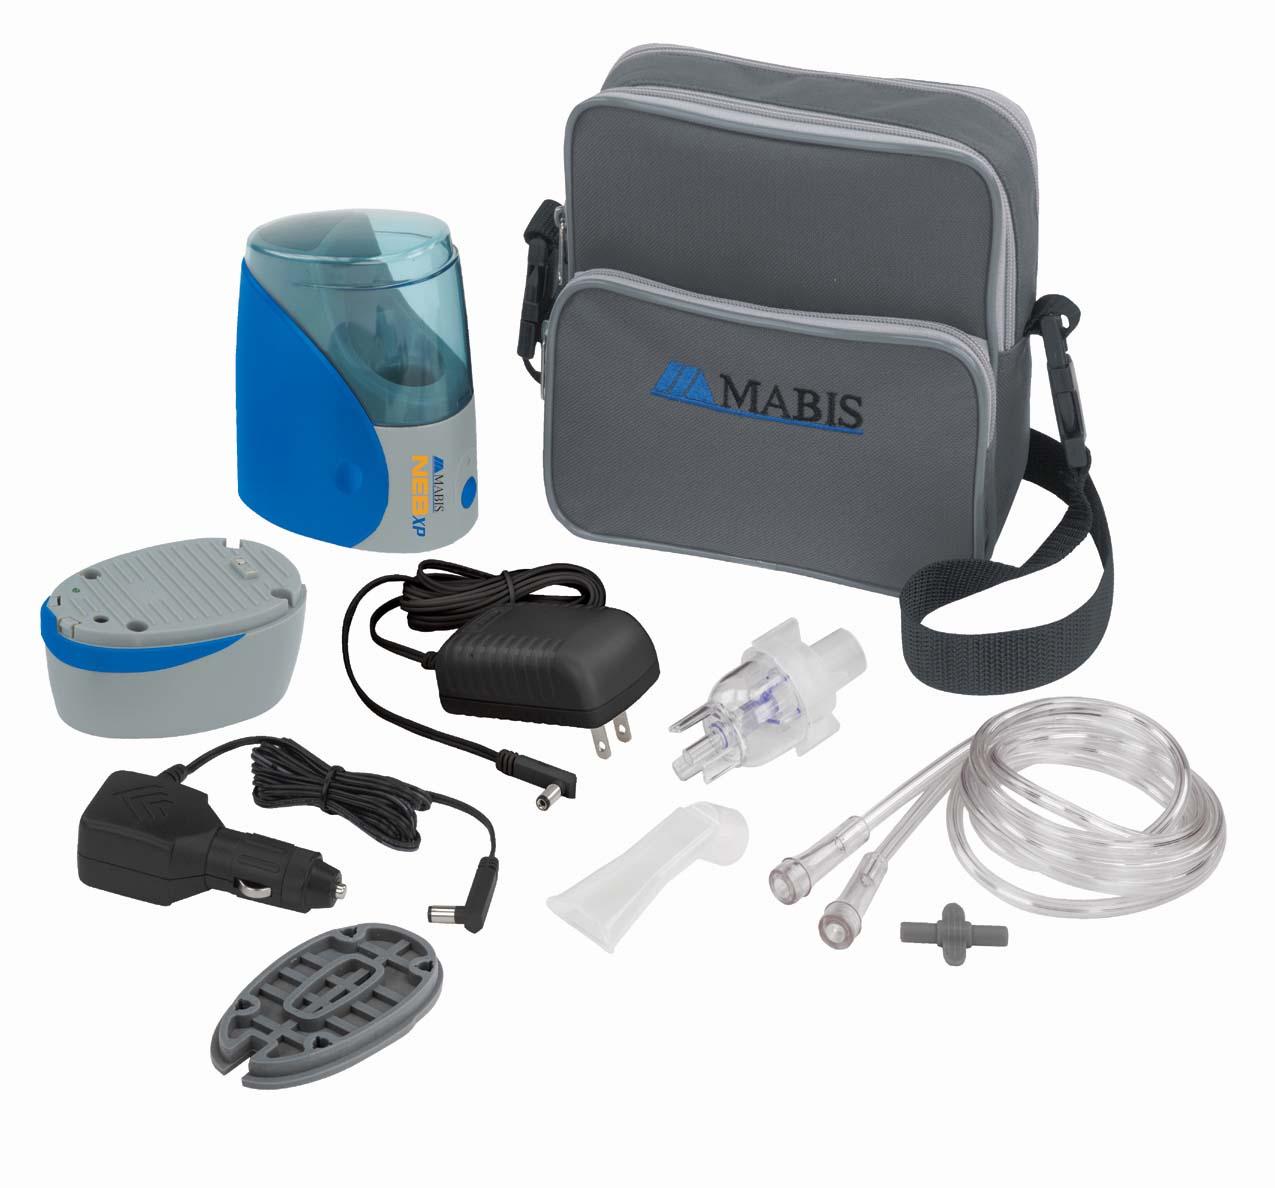 nebxp-portable-handheld-compressor-kit-deluxe-40-136-000-lr.jpg